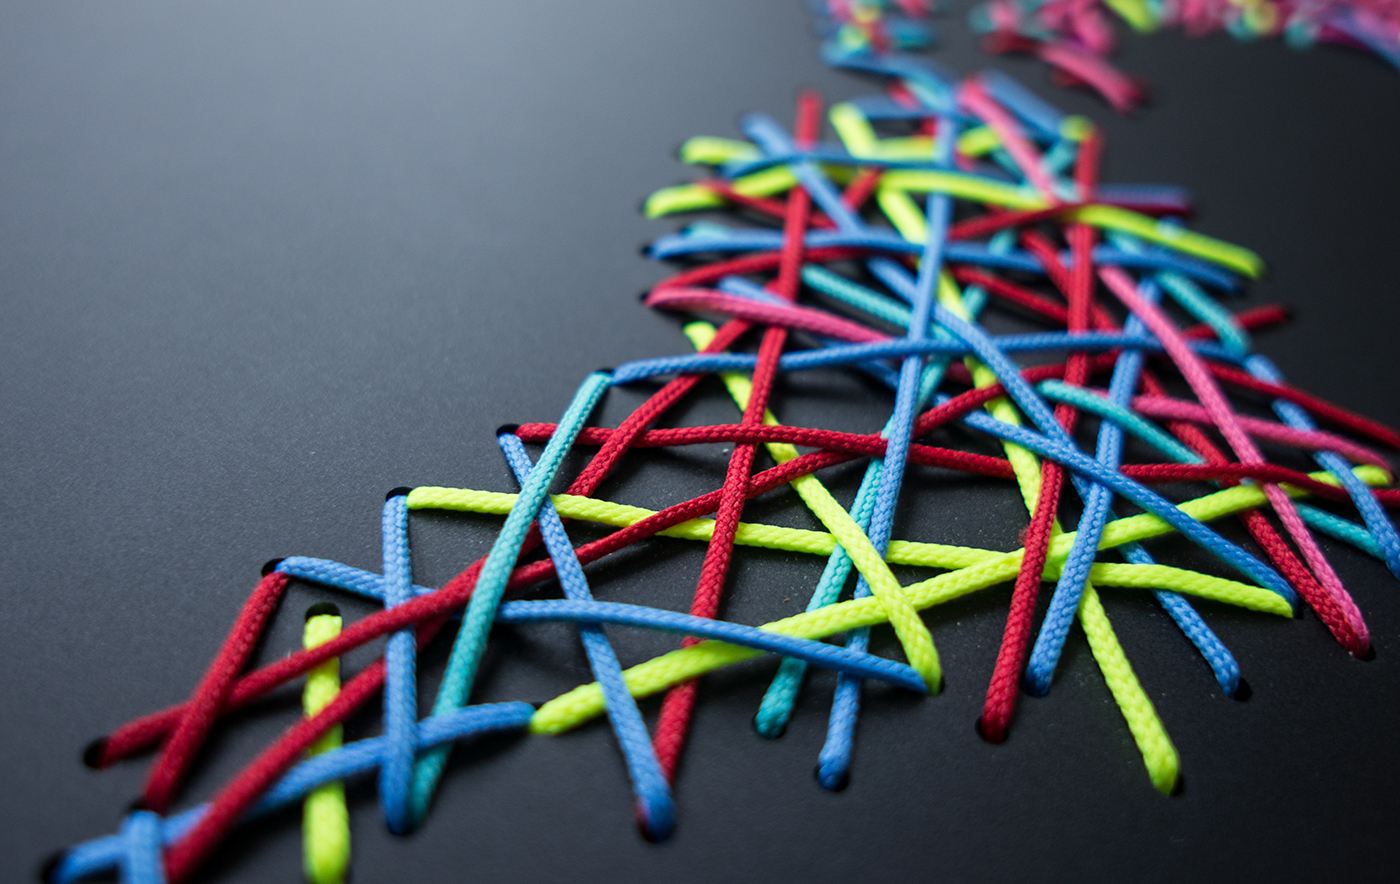 acryl glass nylon cord multilayer sculpture fine art mixed media analog craft handmade Interwoven world Lasercut design material